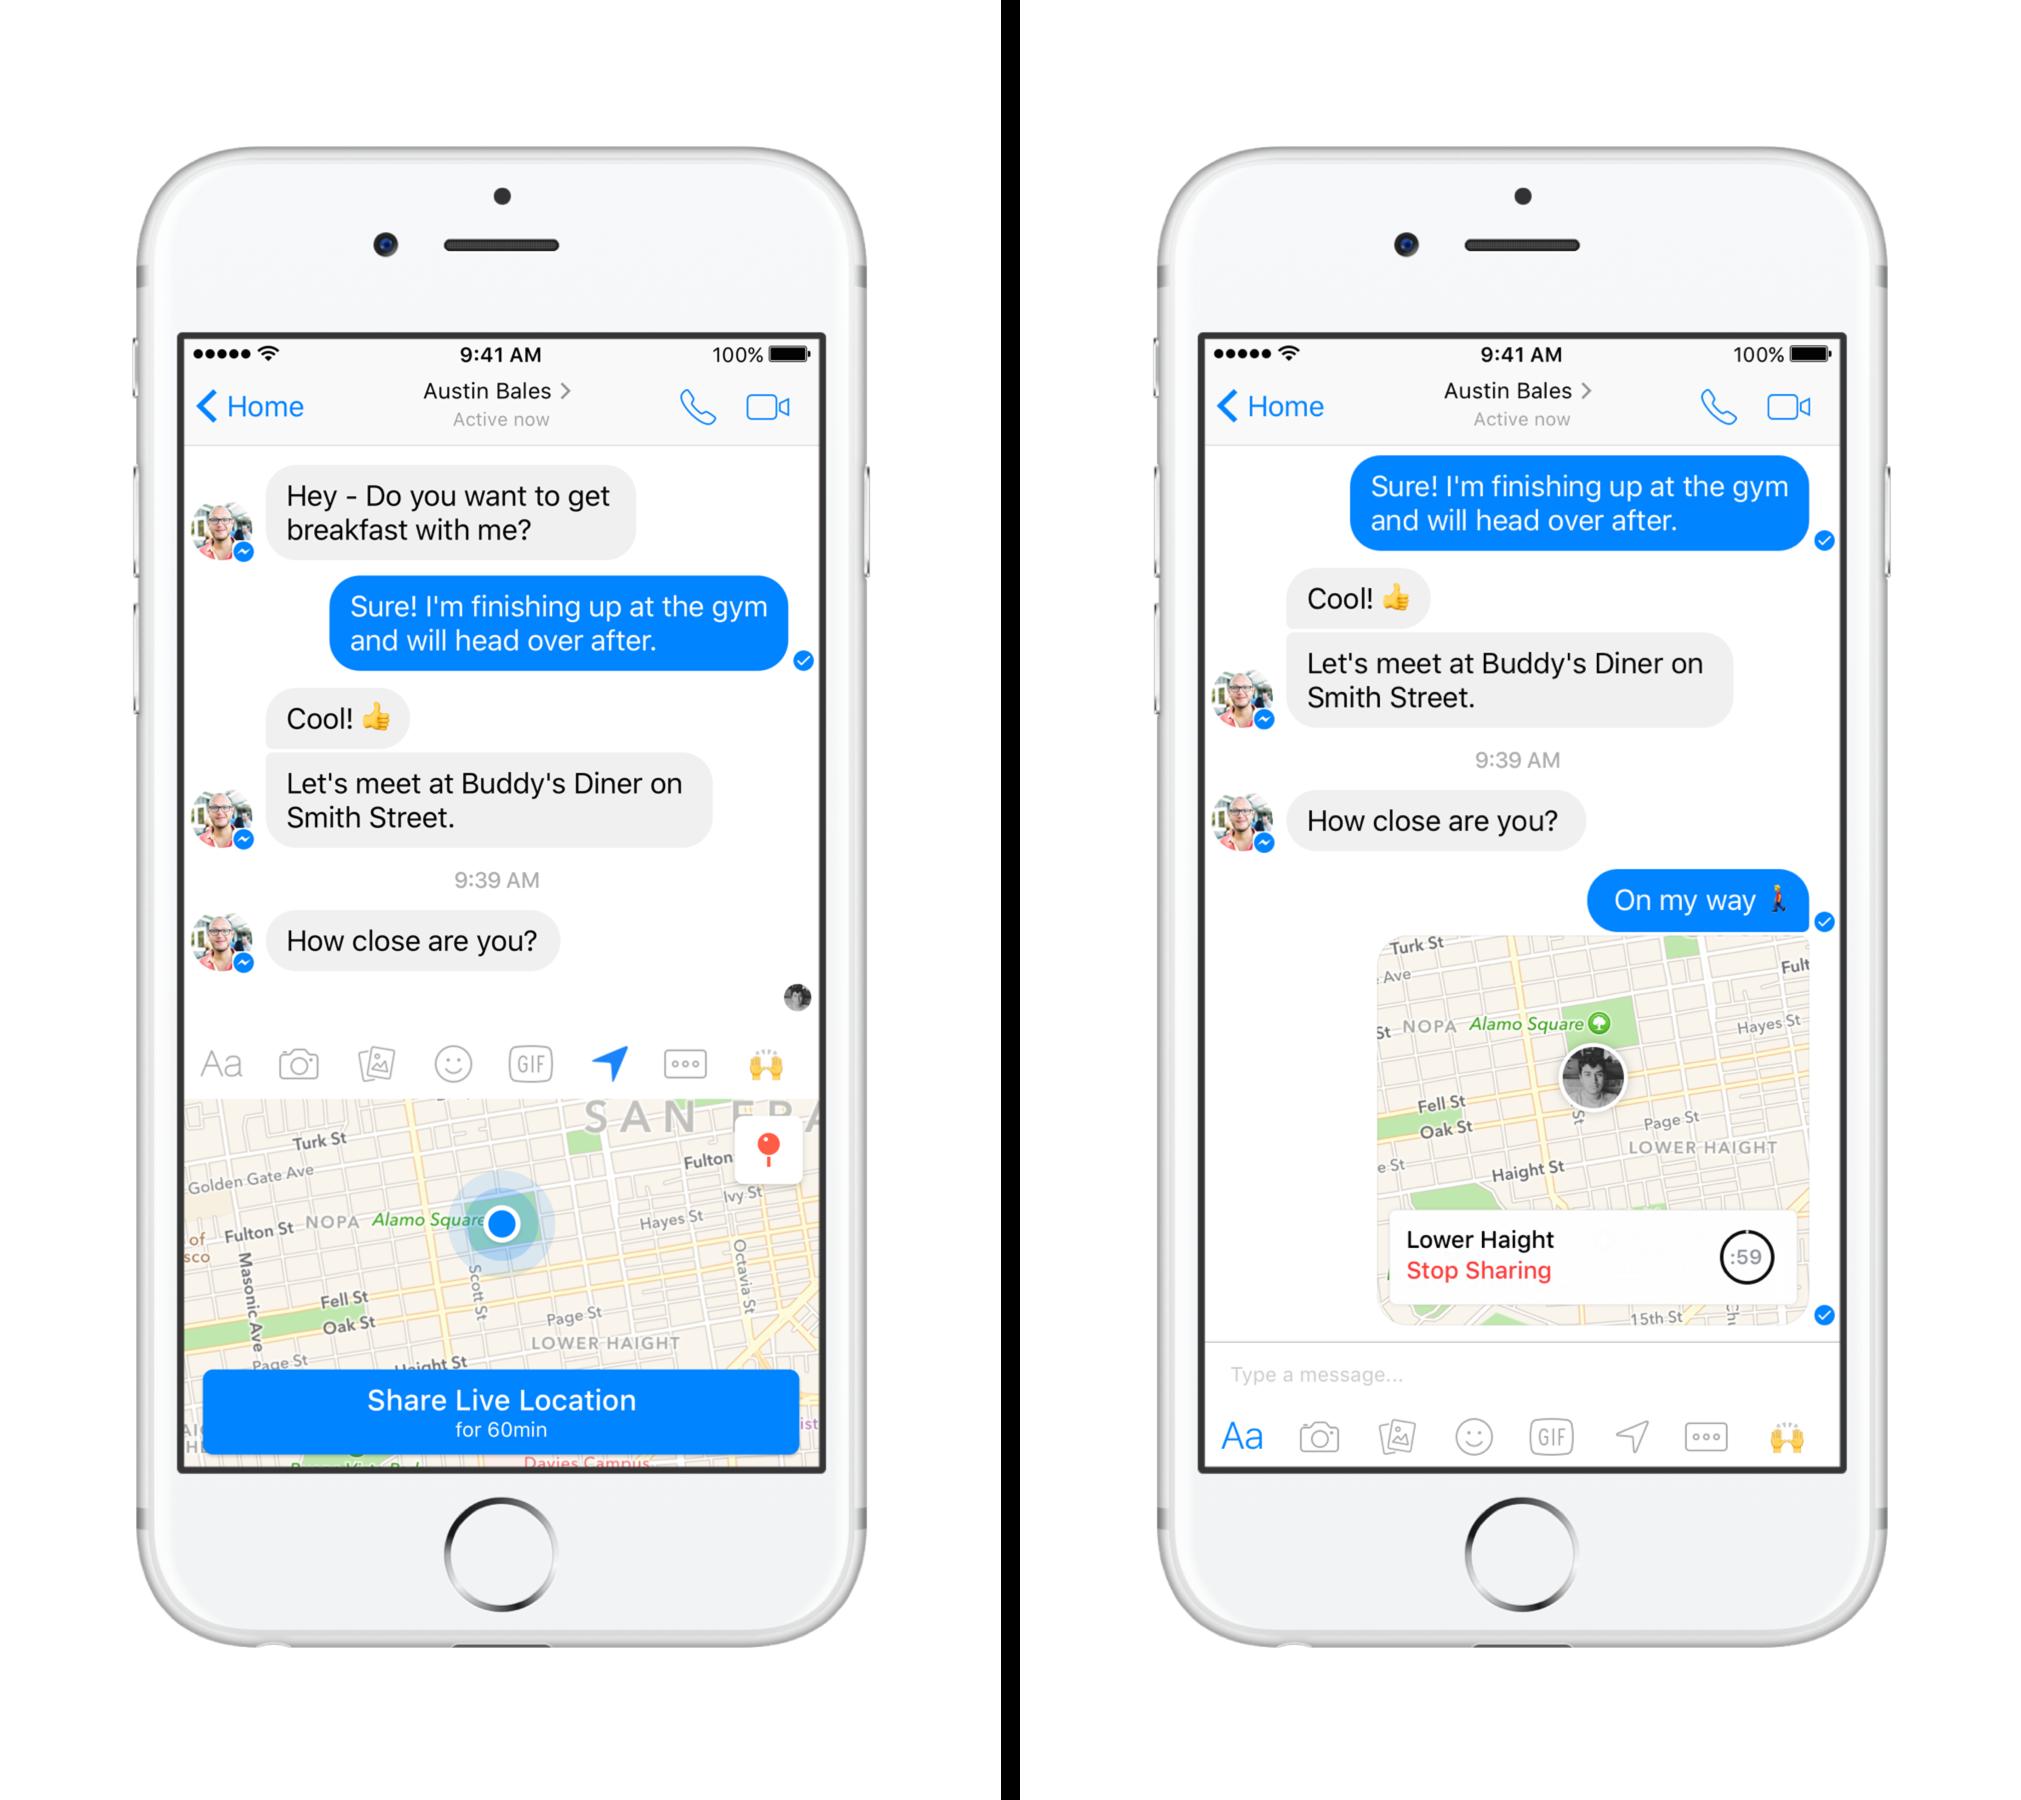 Facebook's Messenger app adds live location-sharing